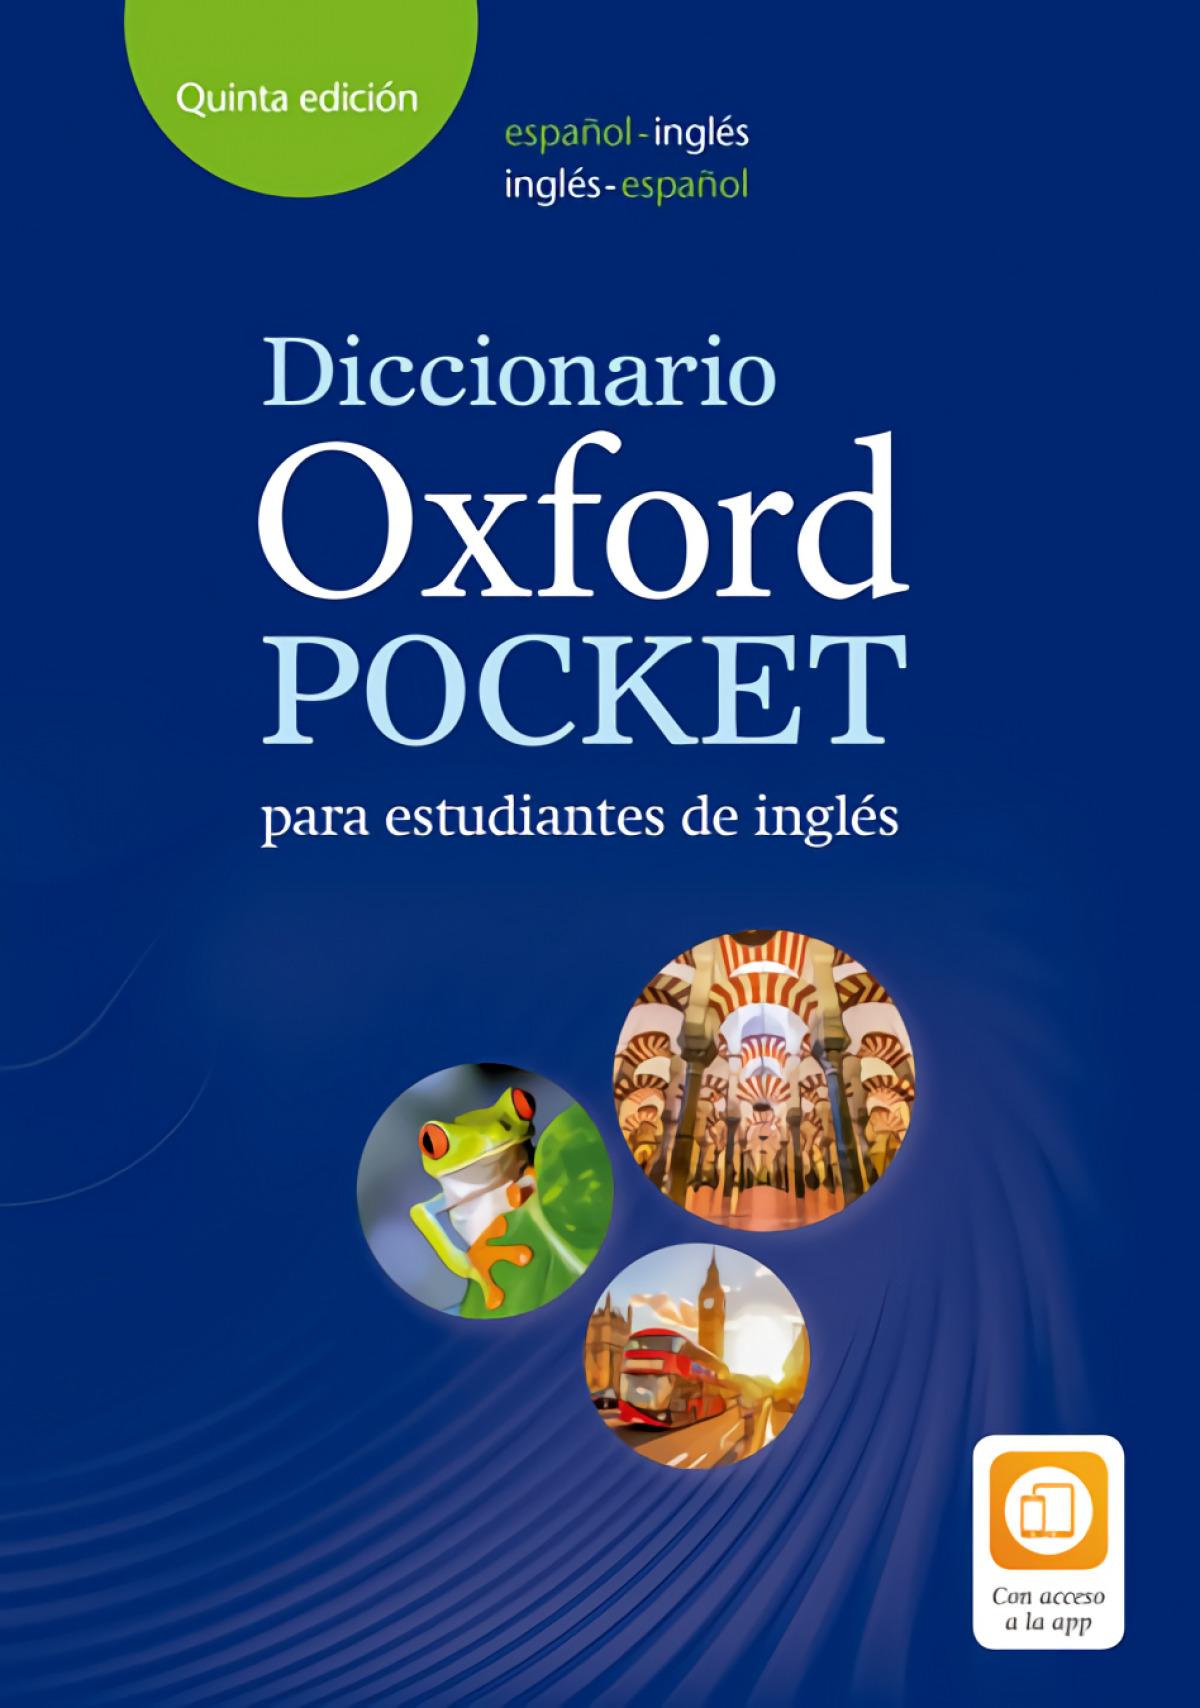 PACK 5 DICTIONARY OXFORD POCKET 5a.EDICION 5 UNID. 9780190523046